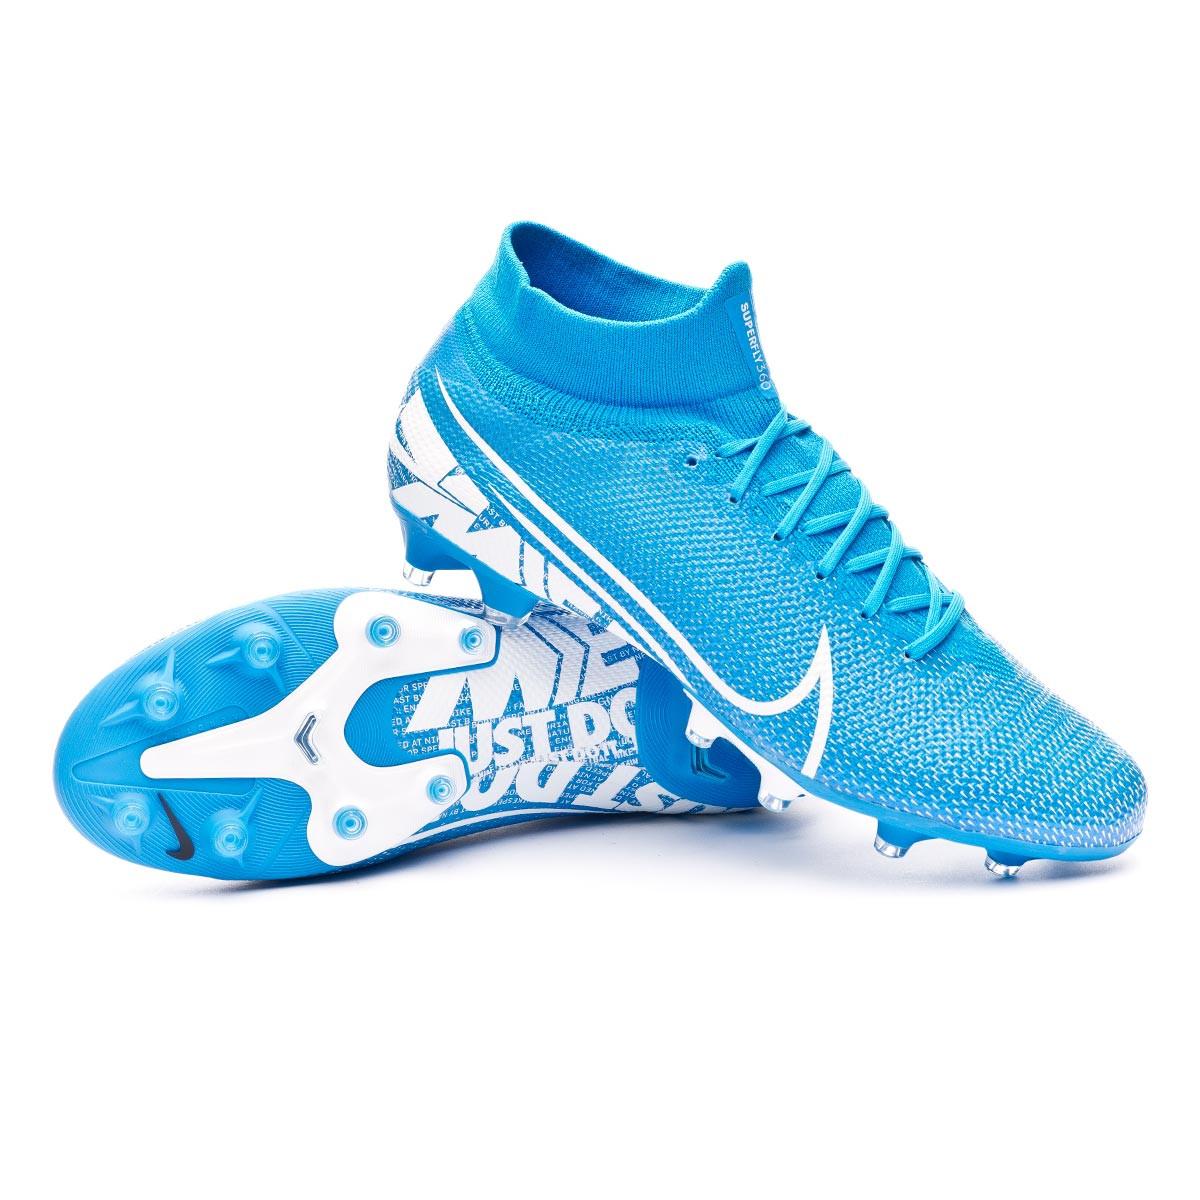 Nike Mercurial Superfly V 5 Ag Pro Chuteiras de Futebol ACC